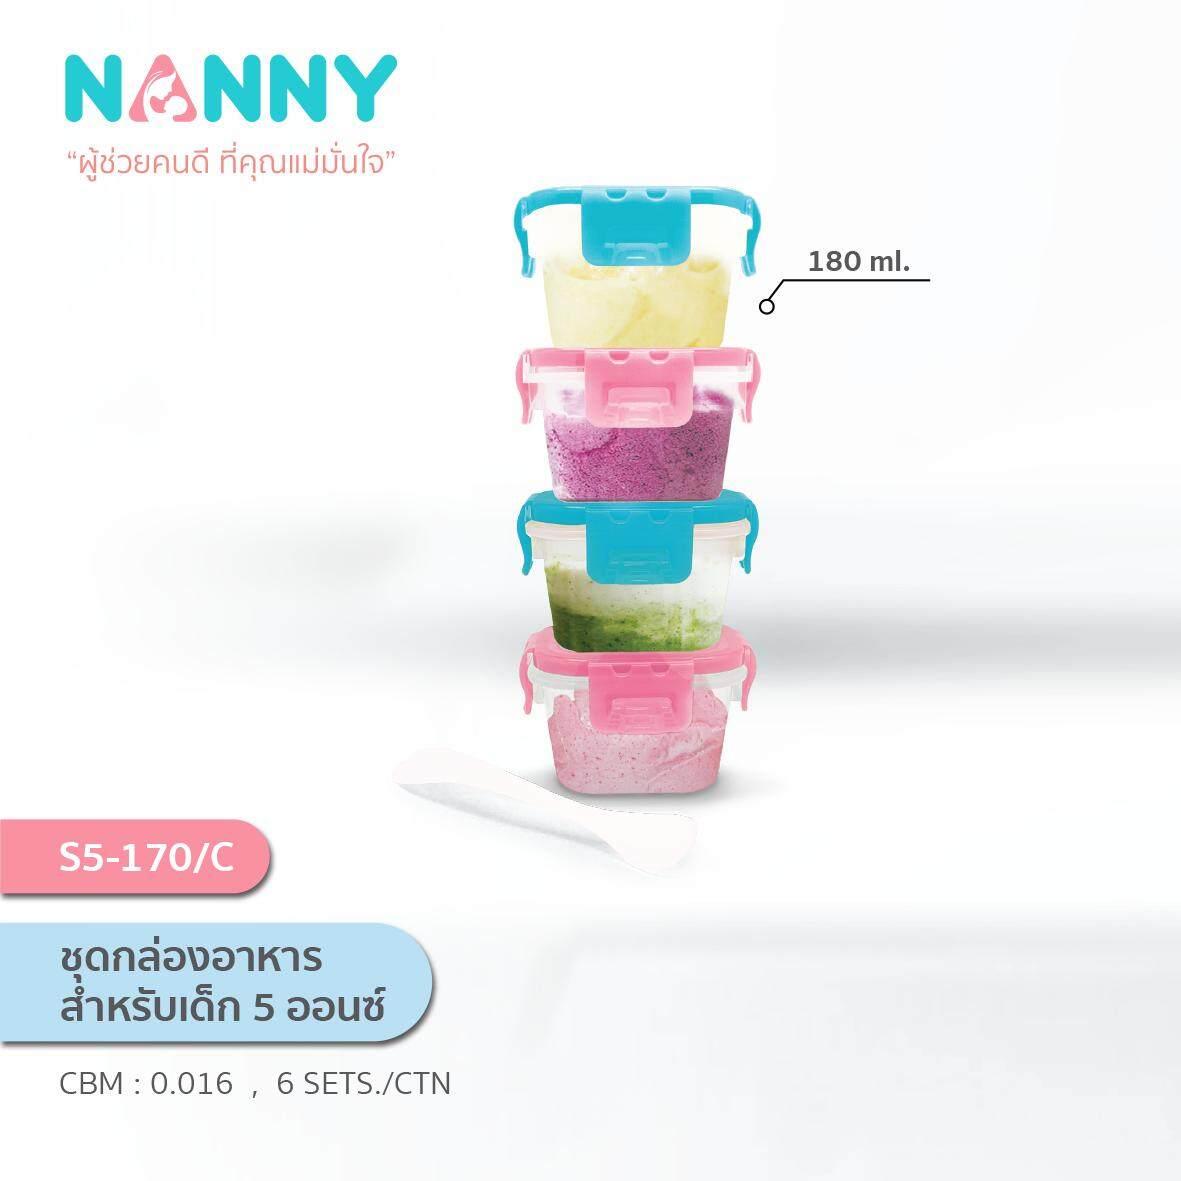 Nanny กล่องอาหารสำหรับเด็ก 5 ออนซ์ พร้อมช้อน รุ่น S5-170 แพ็ค 4  .